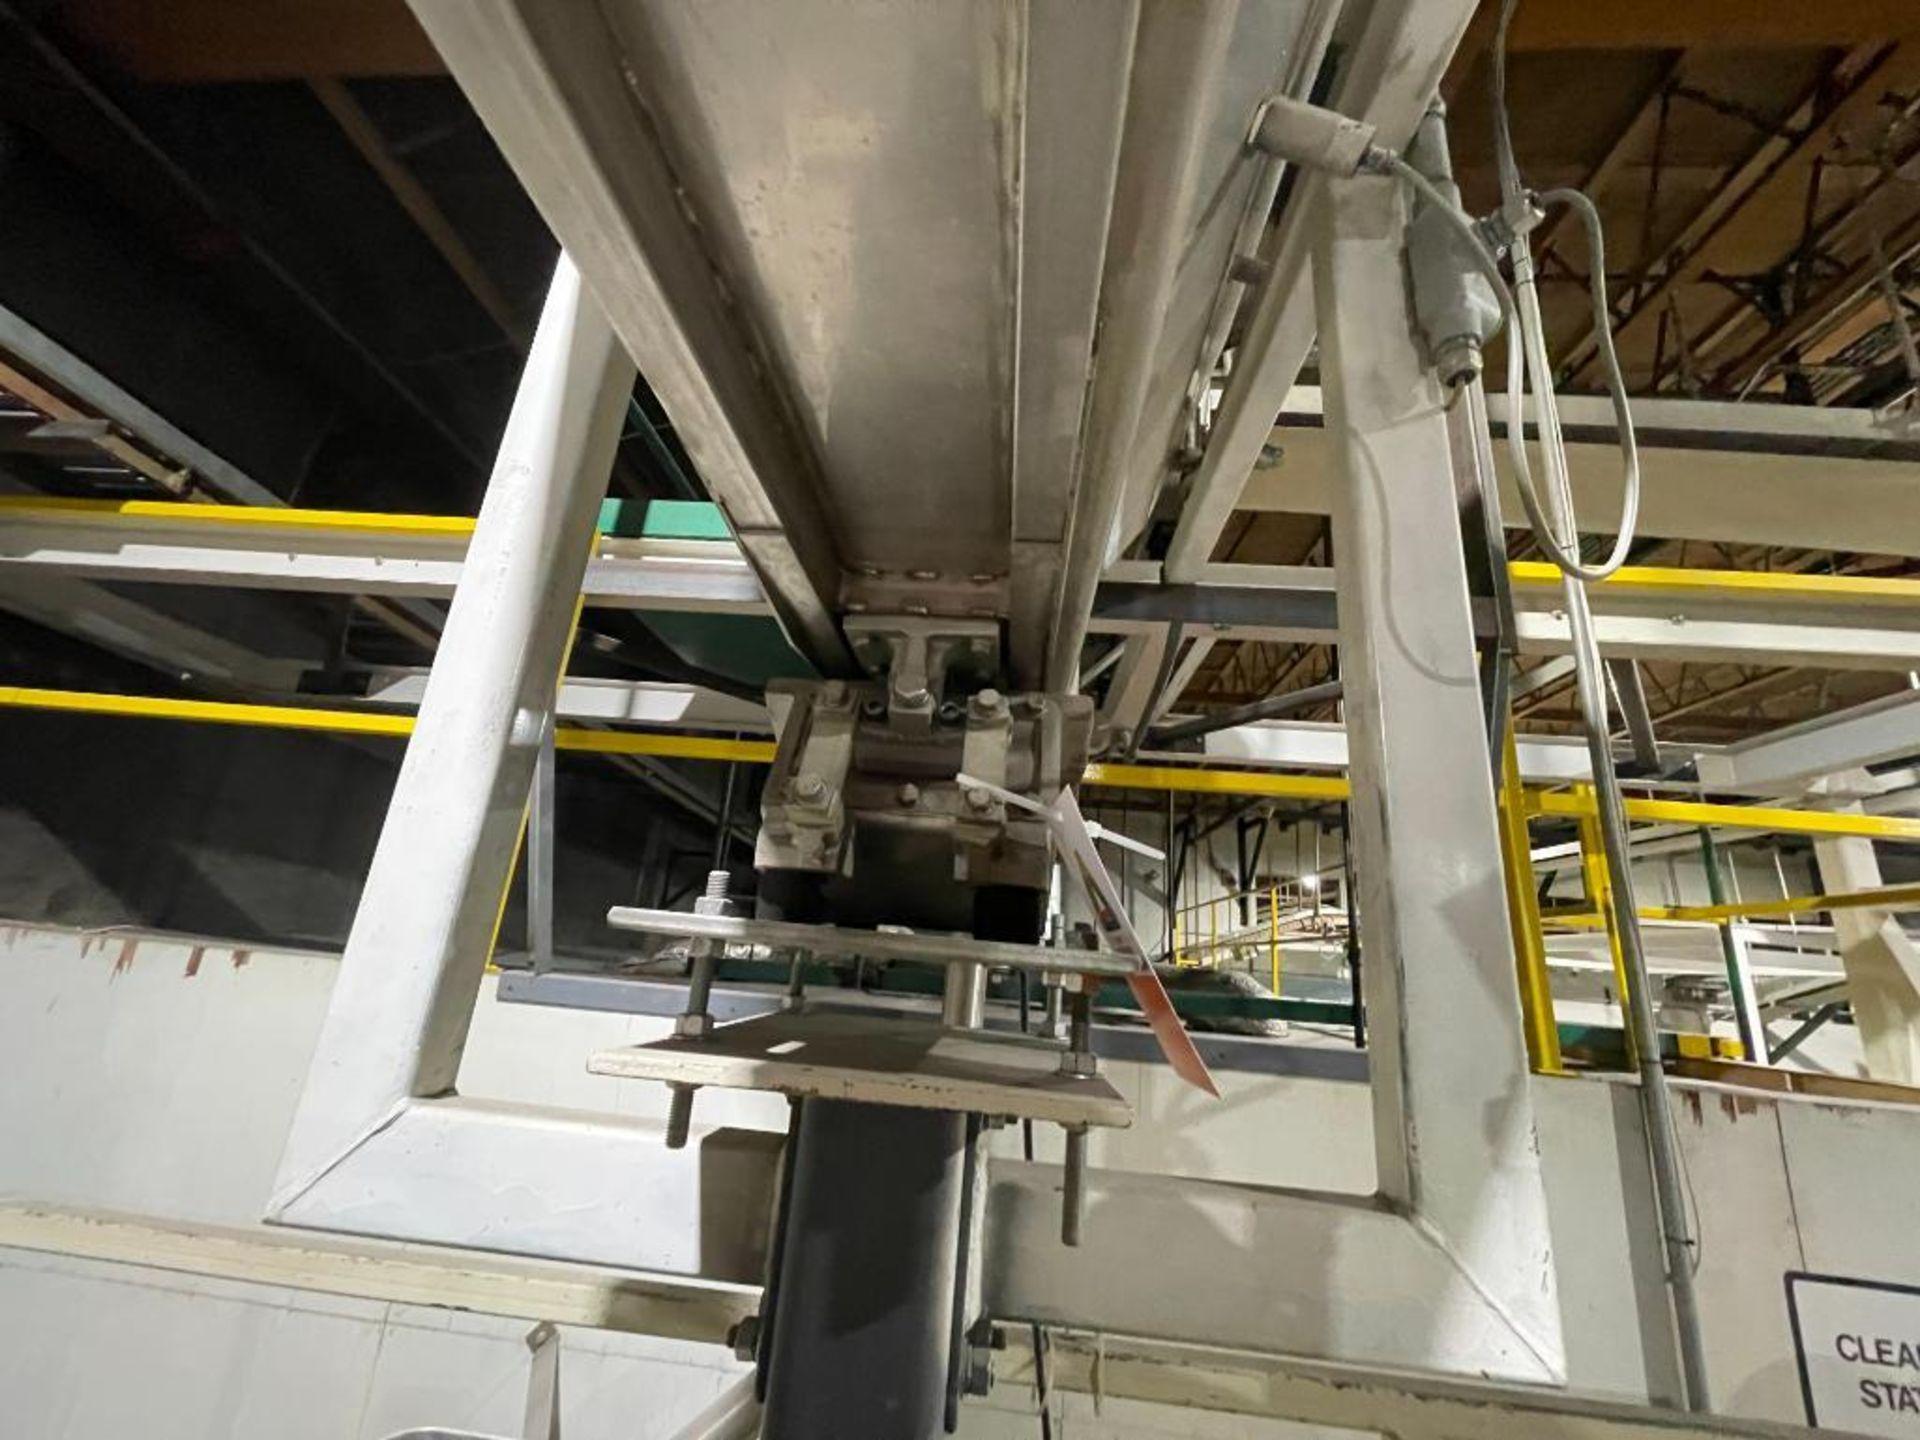 Eriez vibratory conveyor - Image 11 of 12